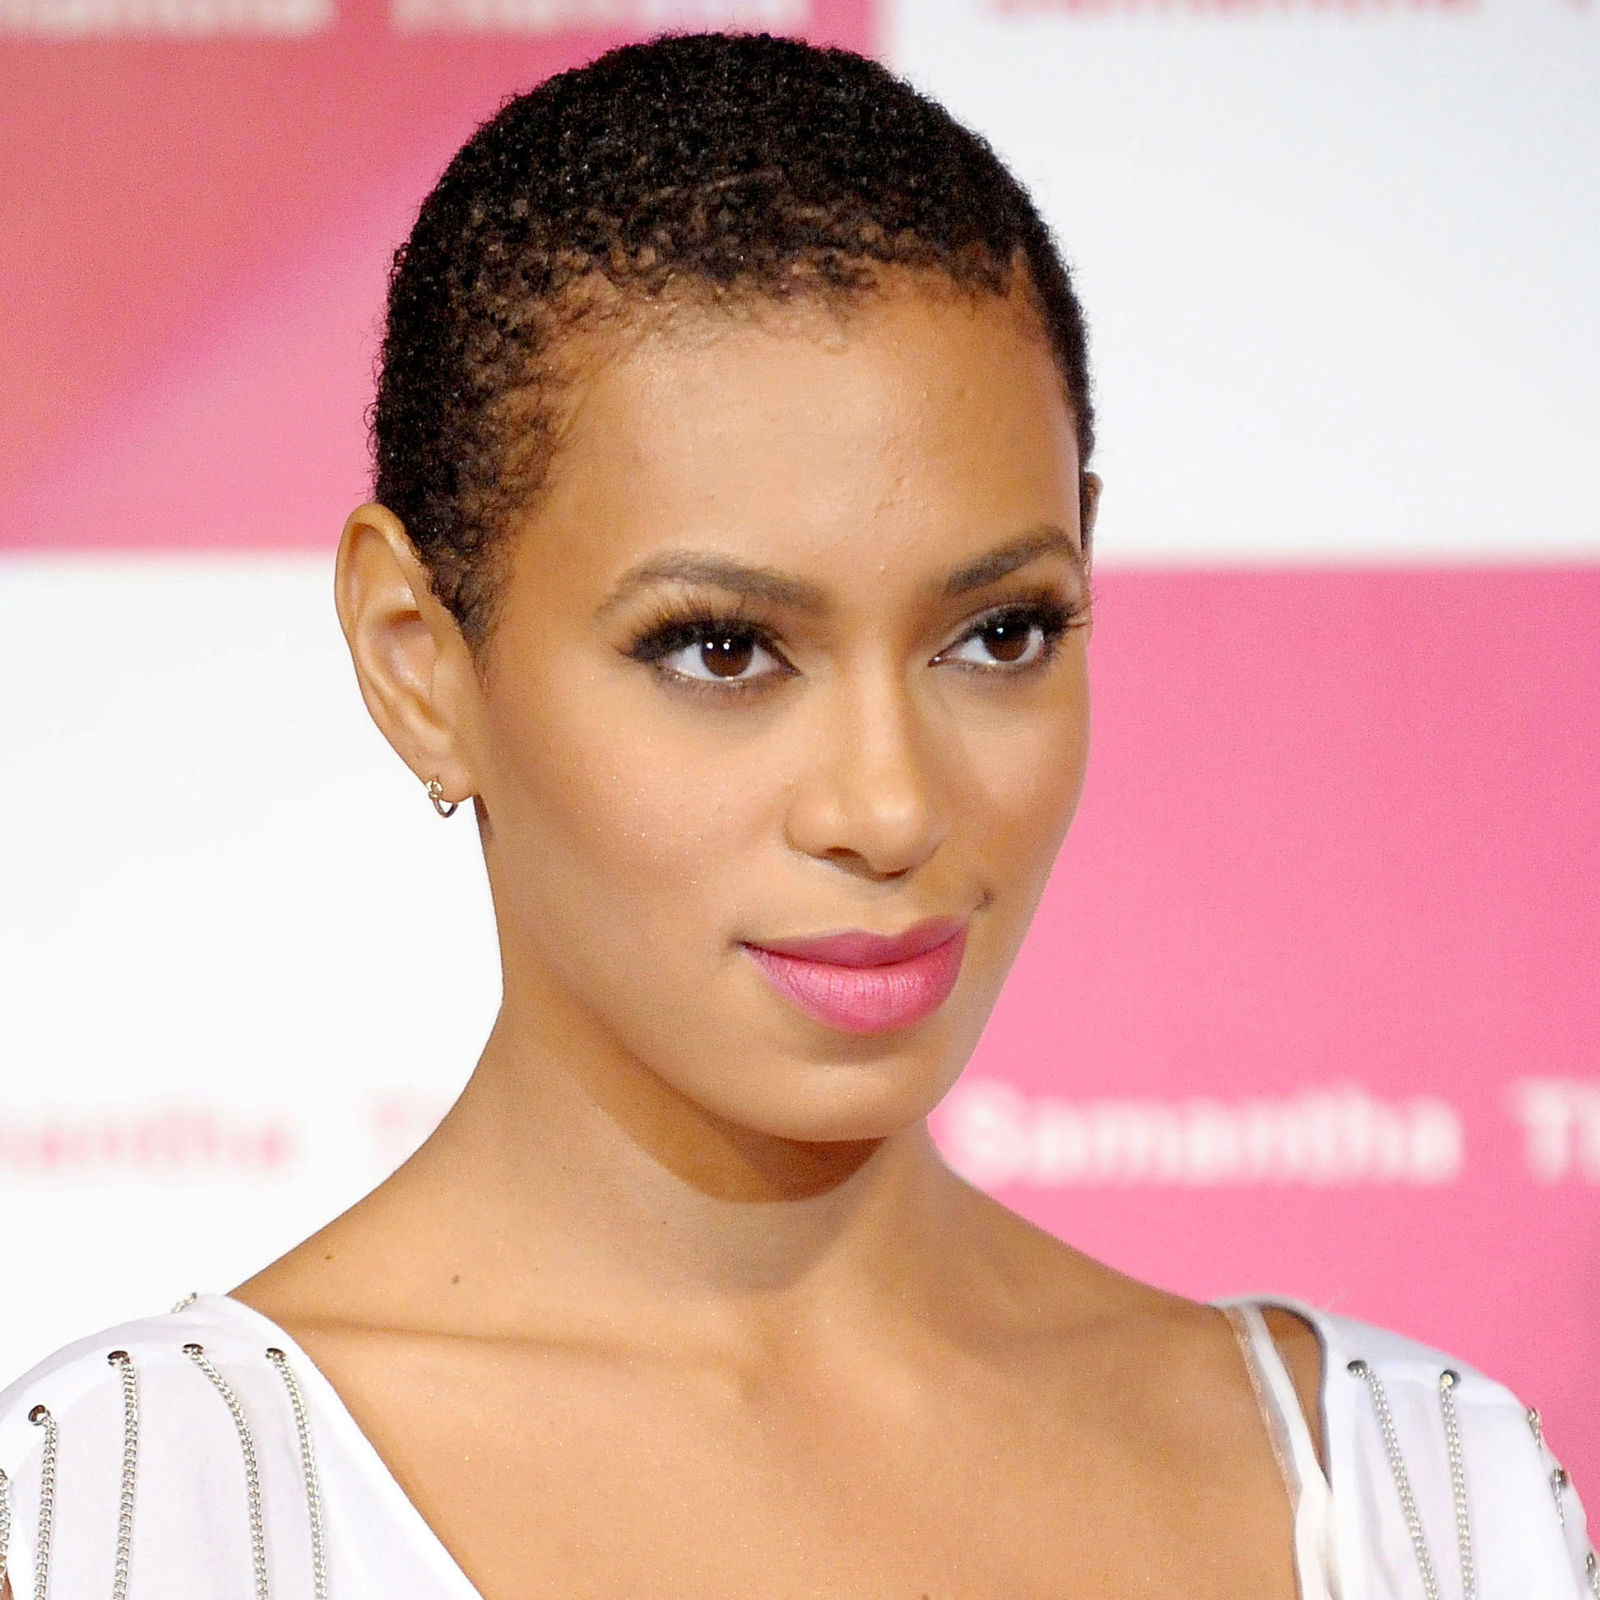 Marvelous Jazzy Black Women Short Hairstyles 2016 Hairstyles 2016 Hair Hairstyles For Women Draintrainus